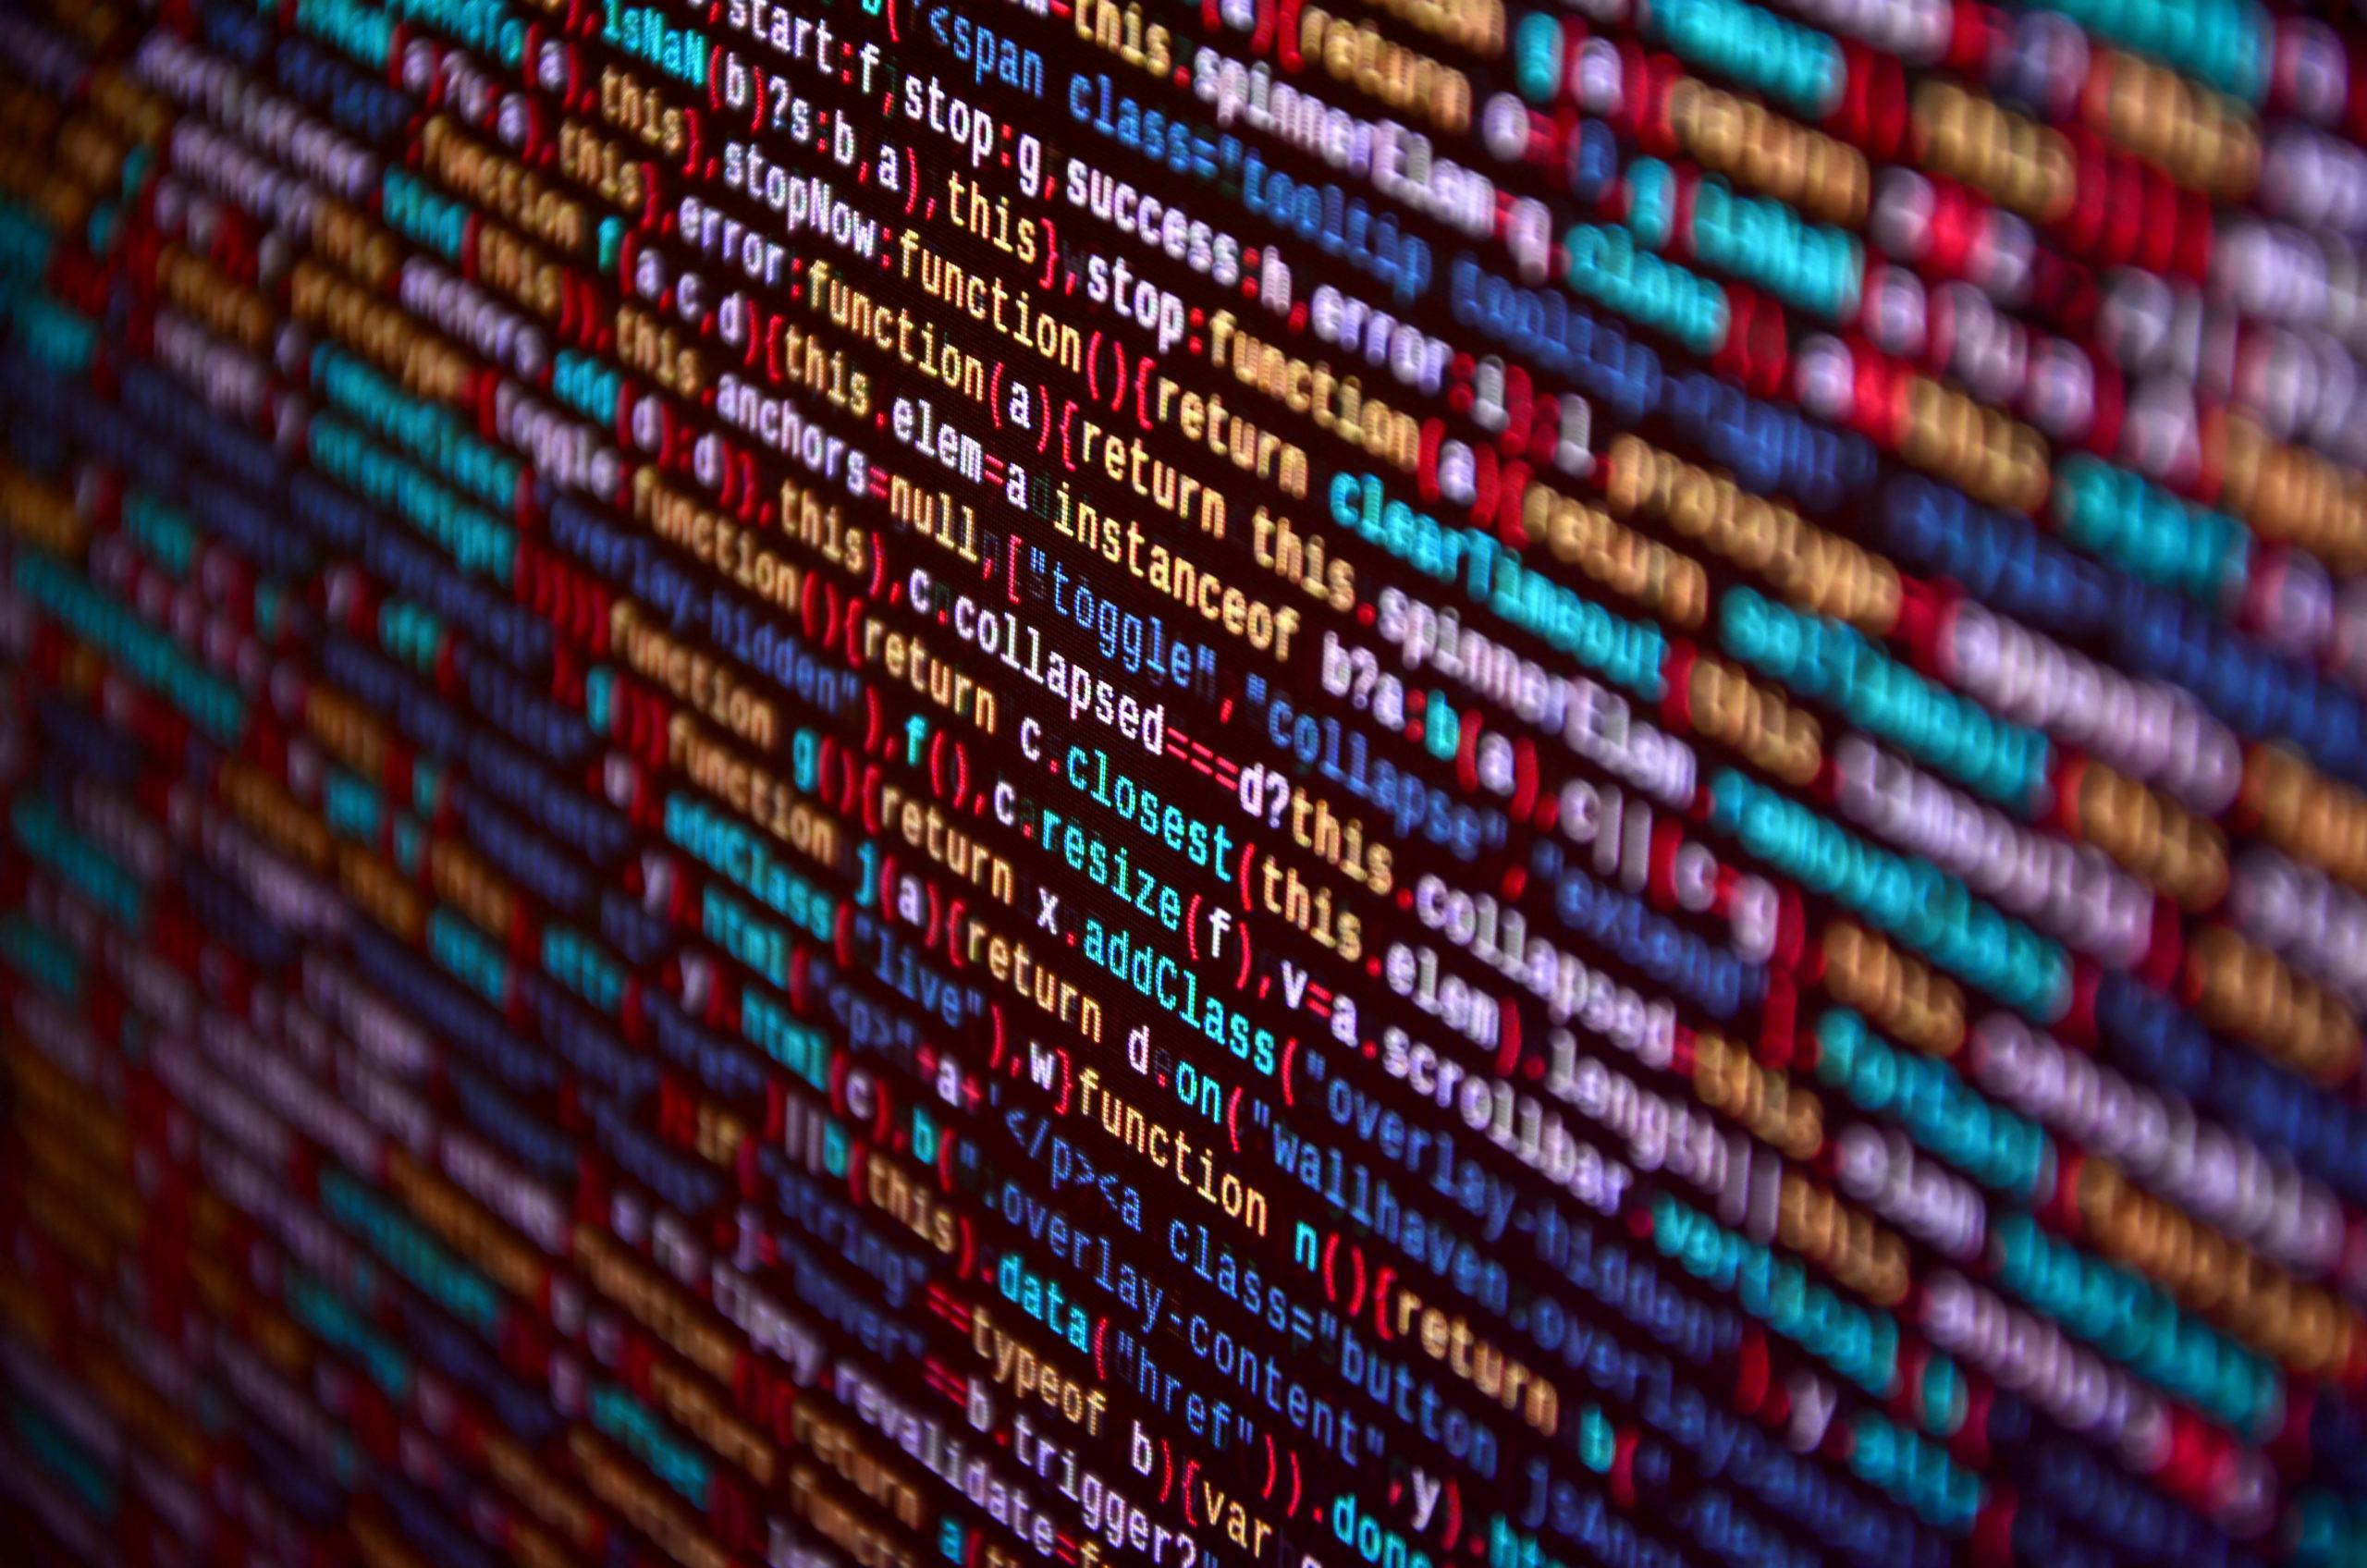 Software developer programming code on computer. Abstract computer script source code